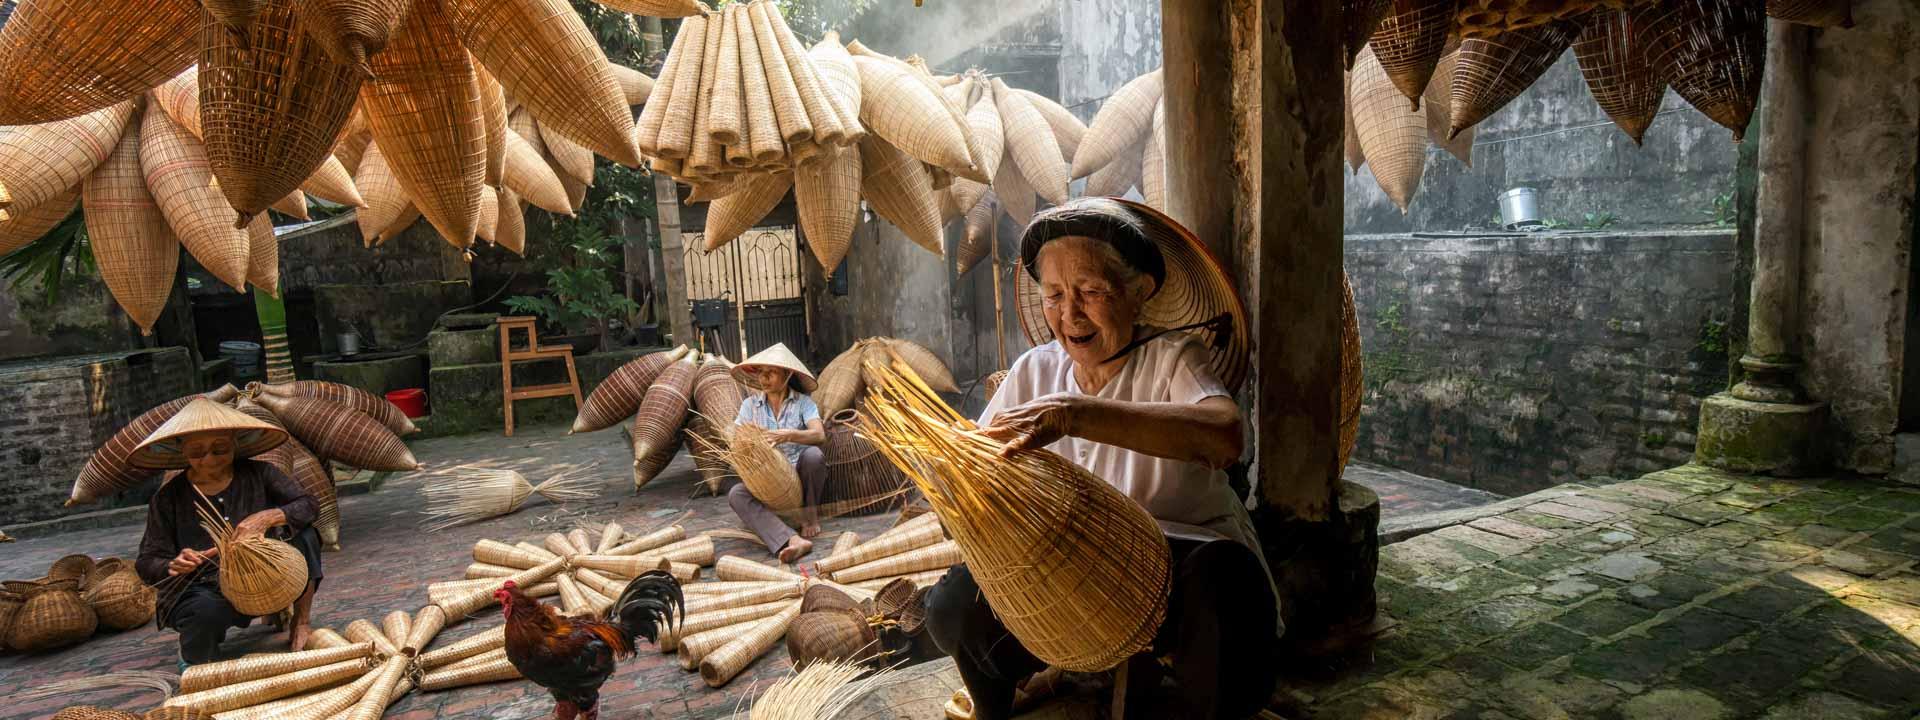 Northern Tribes & Markets 5 days